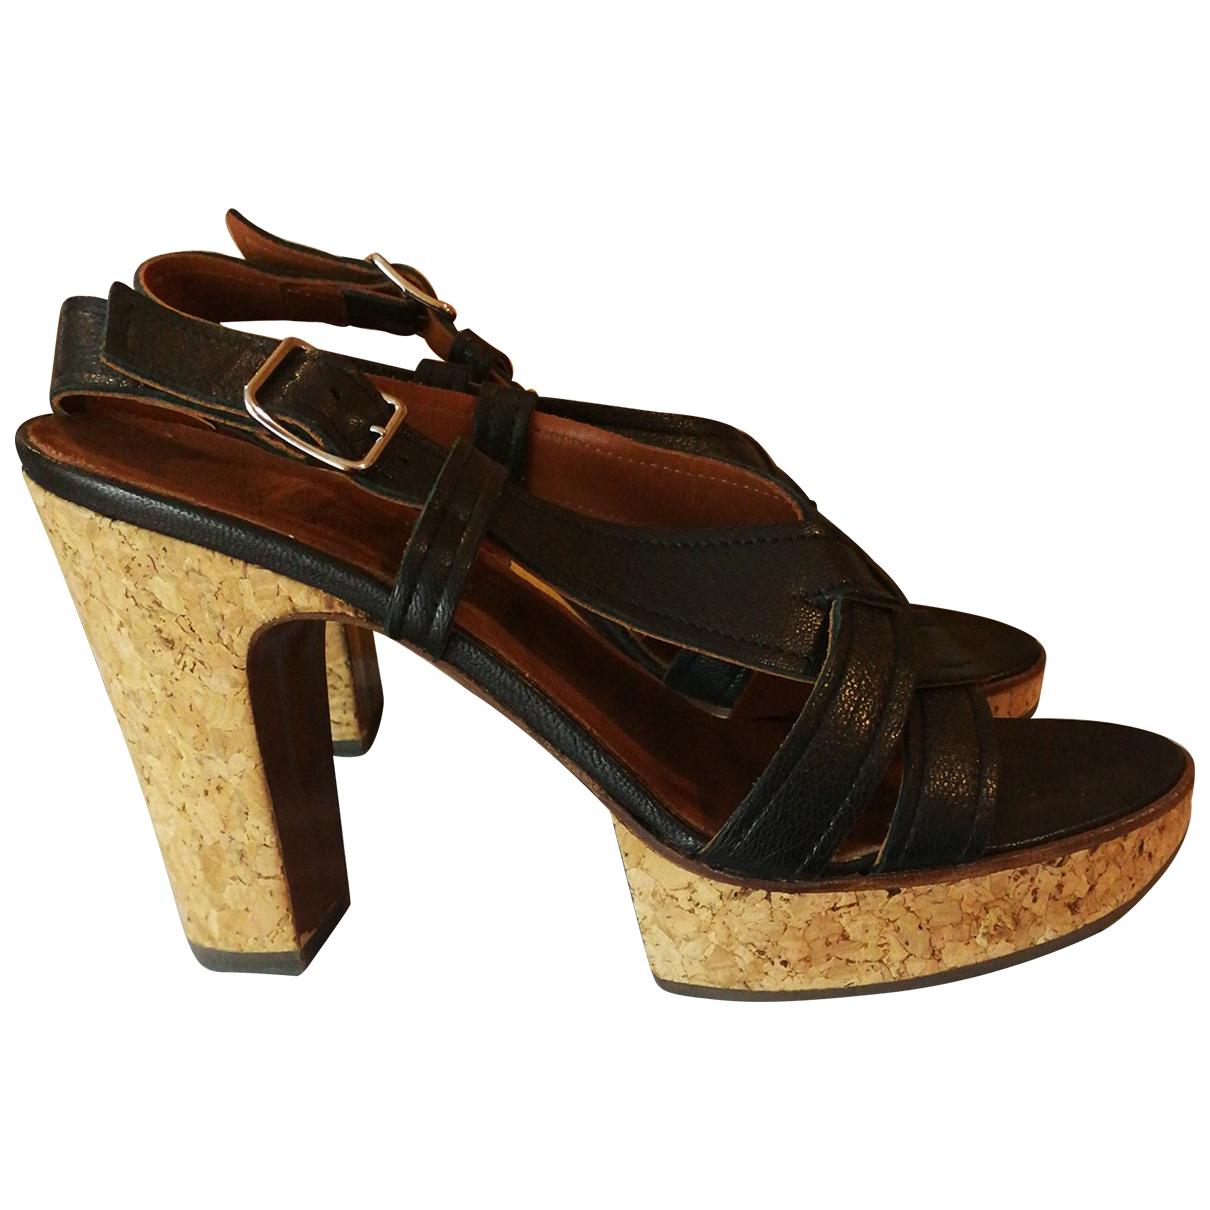 Lanvin \N Black Leather Sandals for Women 40 EU